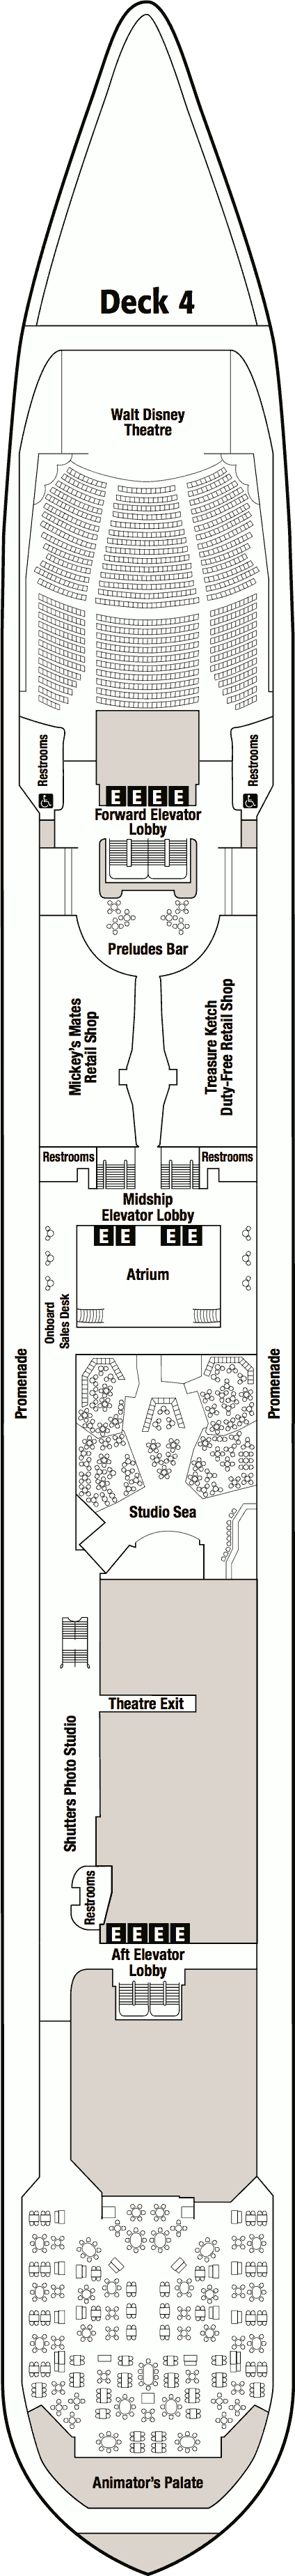 disney wonder deck plan pdf